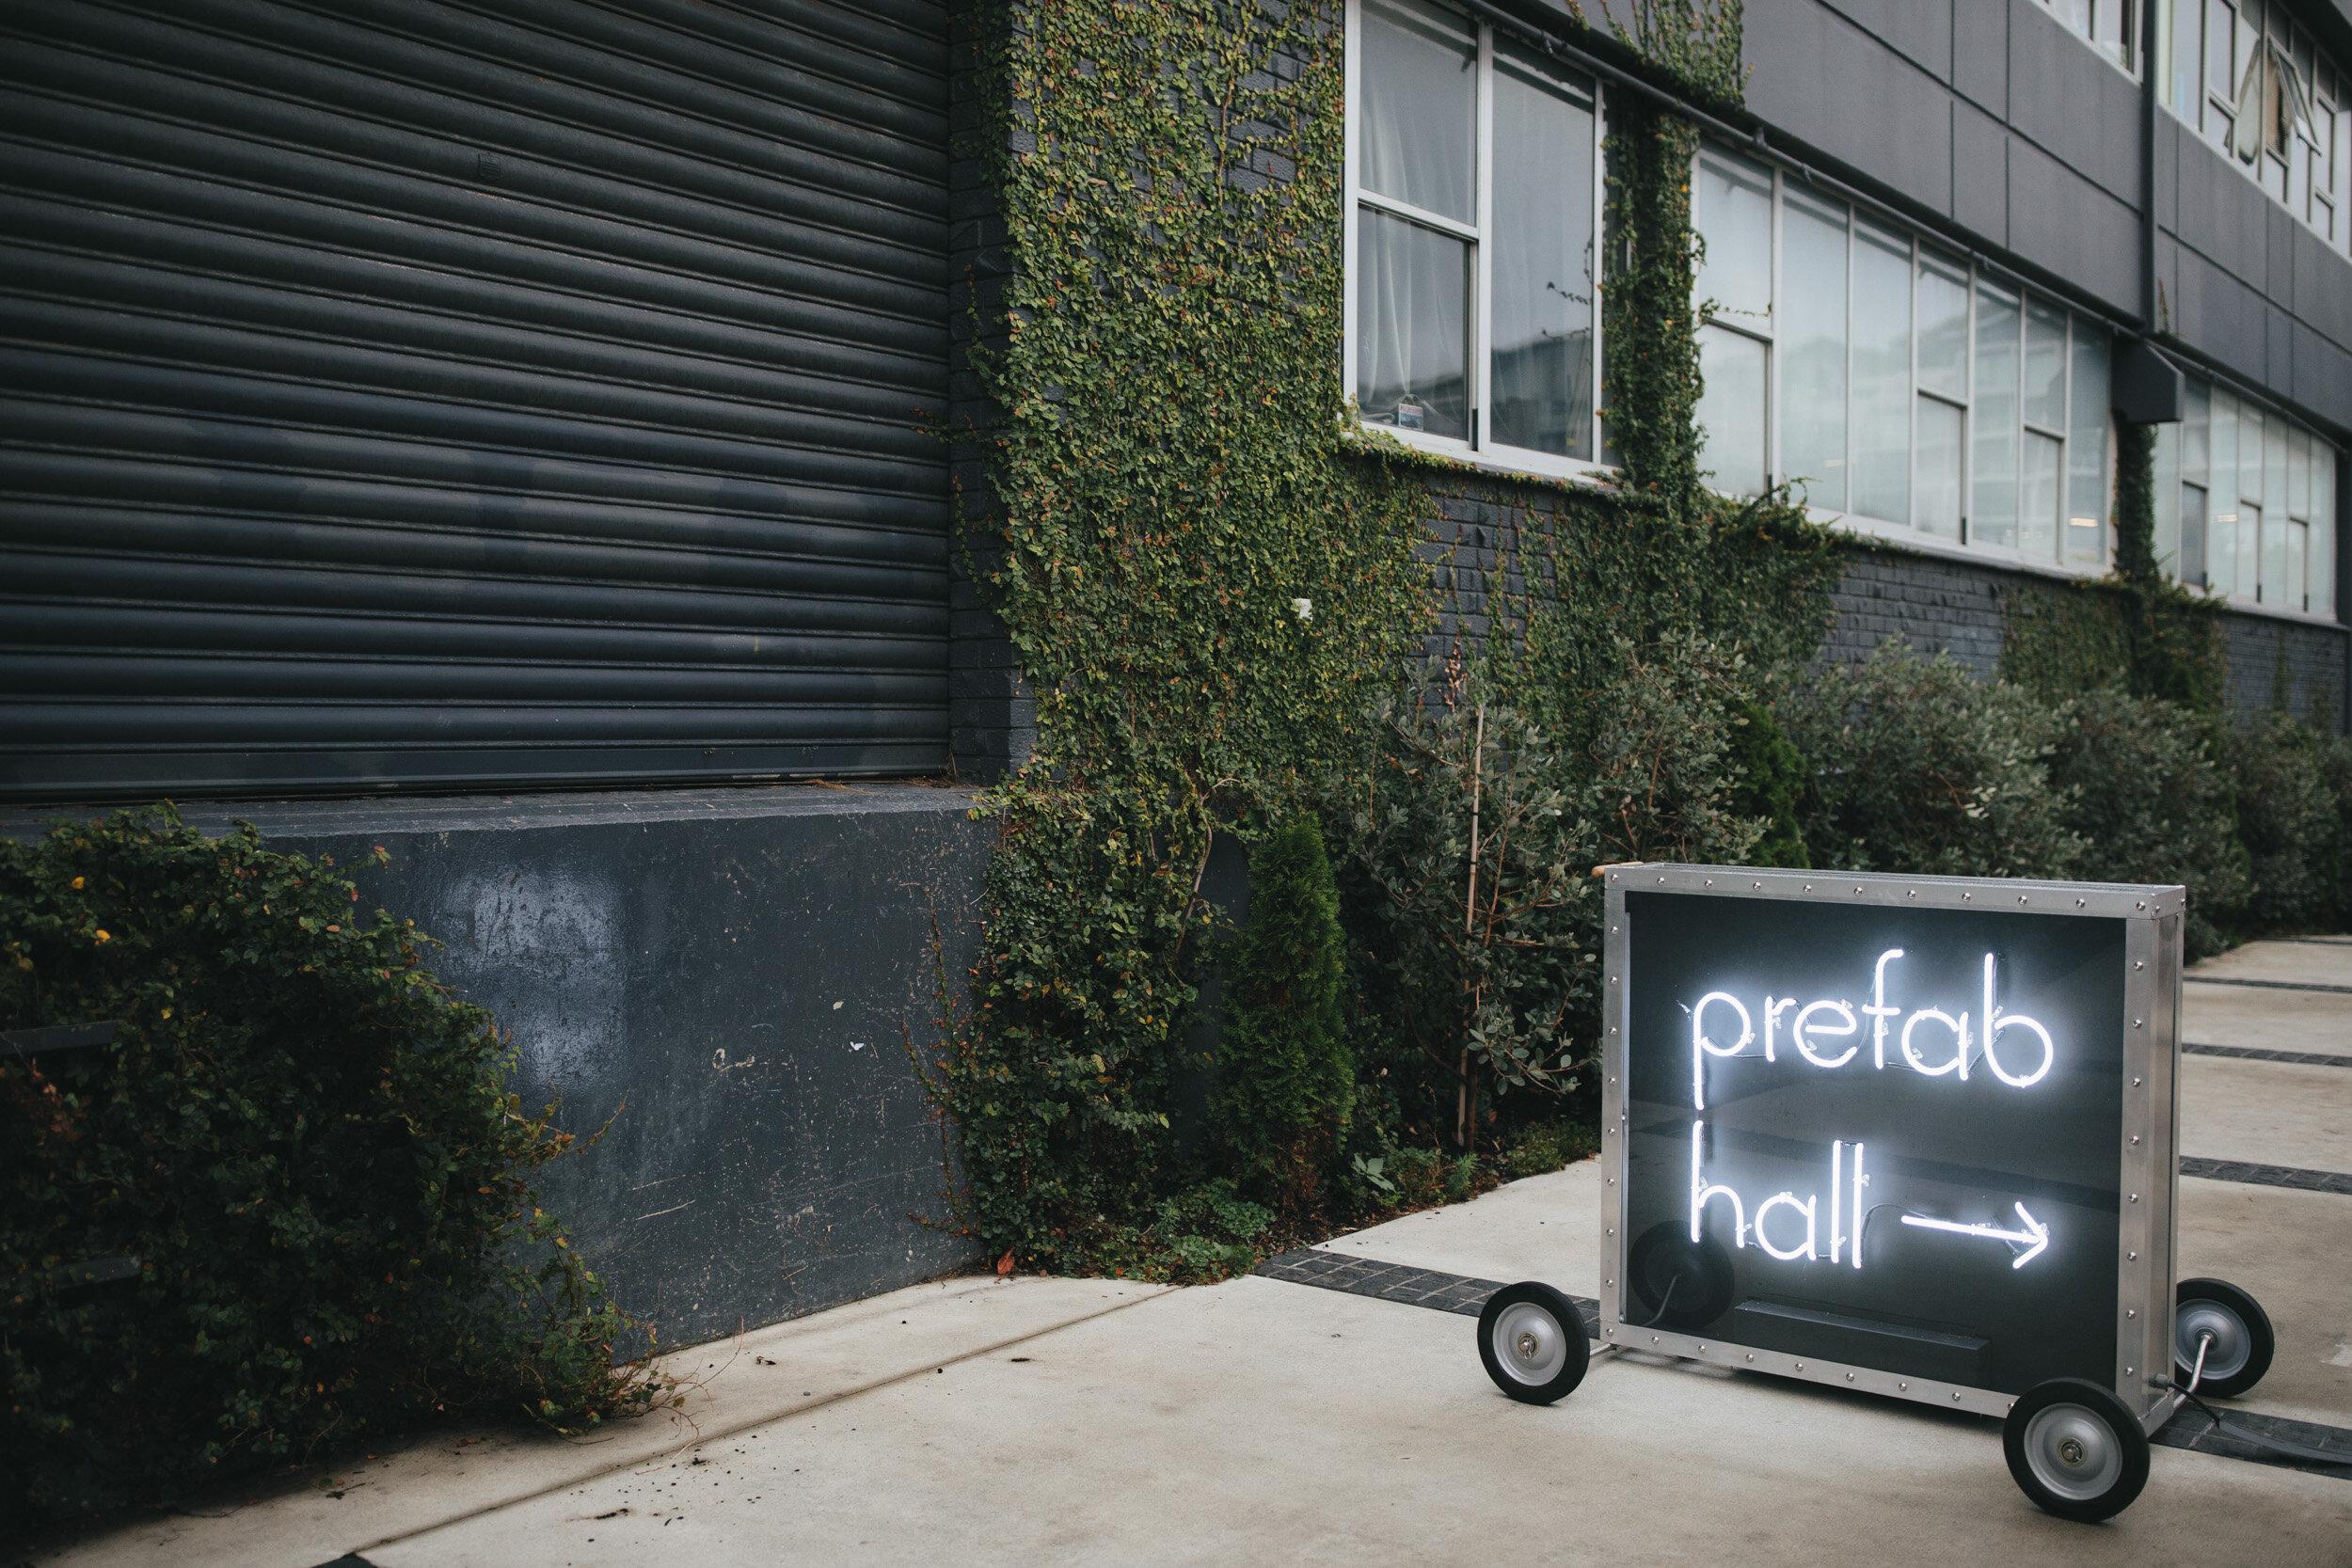 Prefab Hall wedding venue review